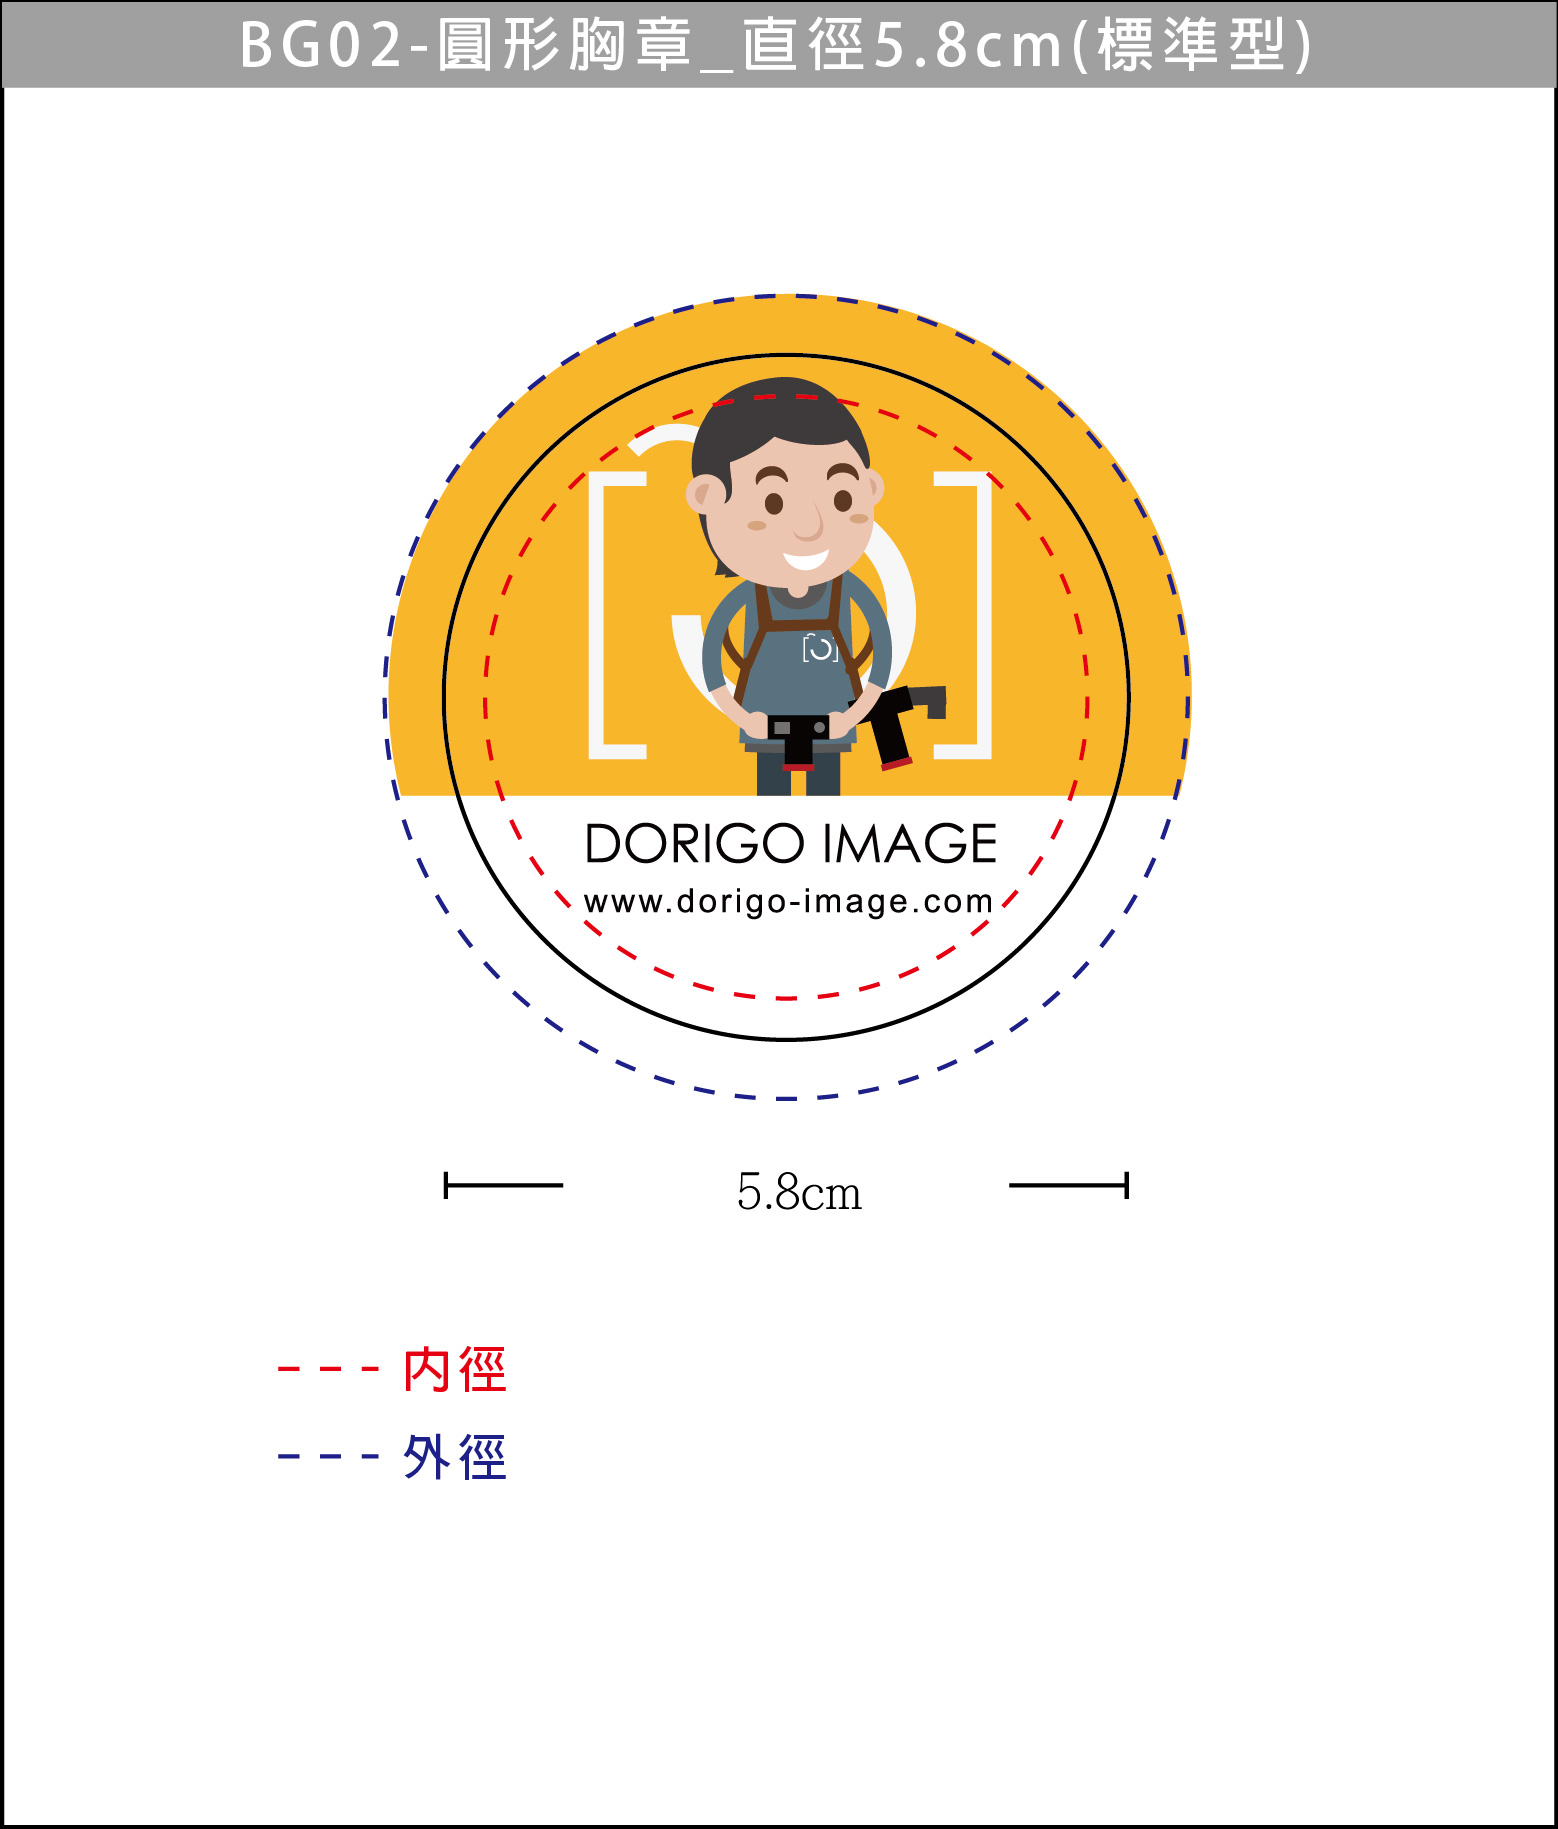 DORIGO IMAGE 圓形磁鐵好禮